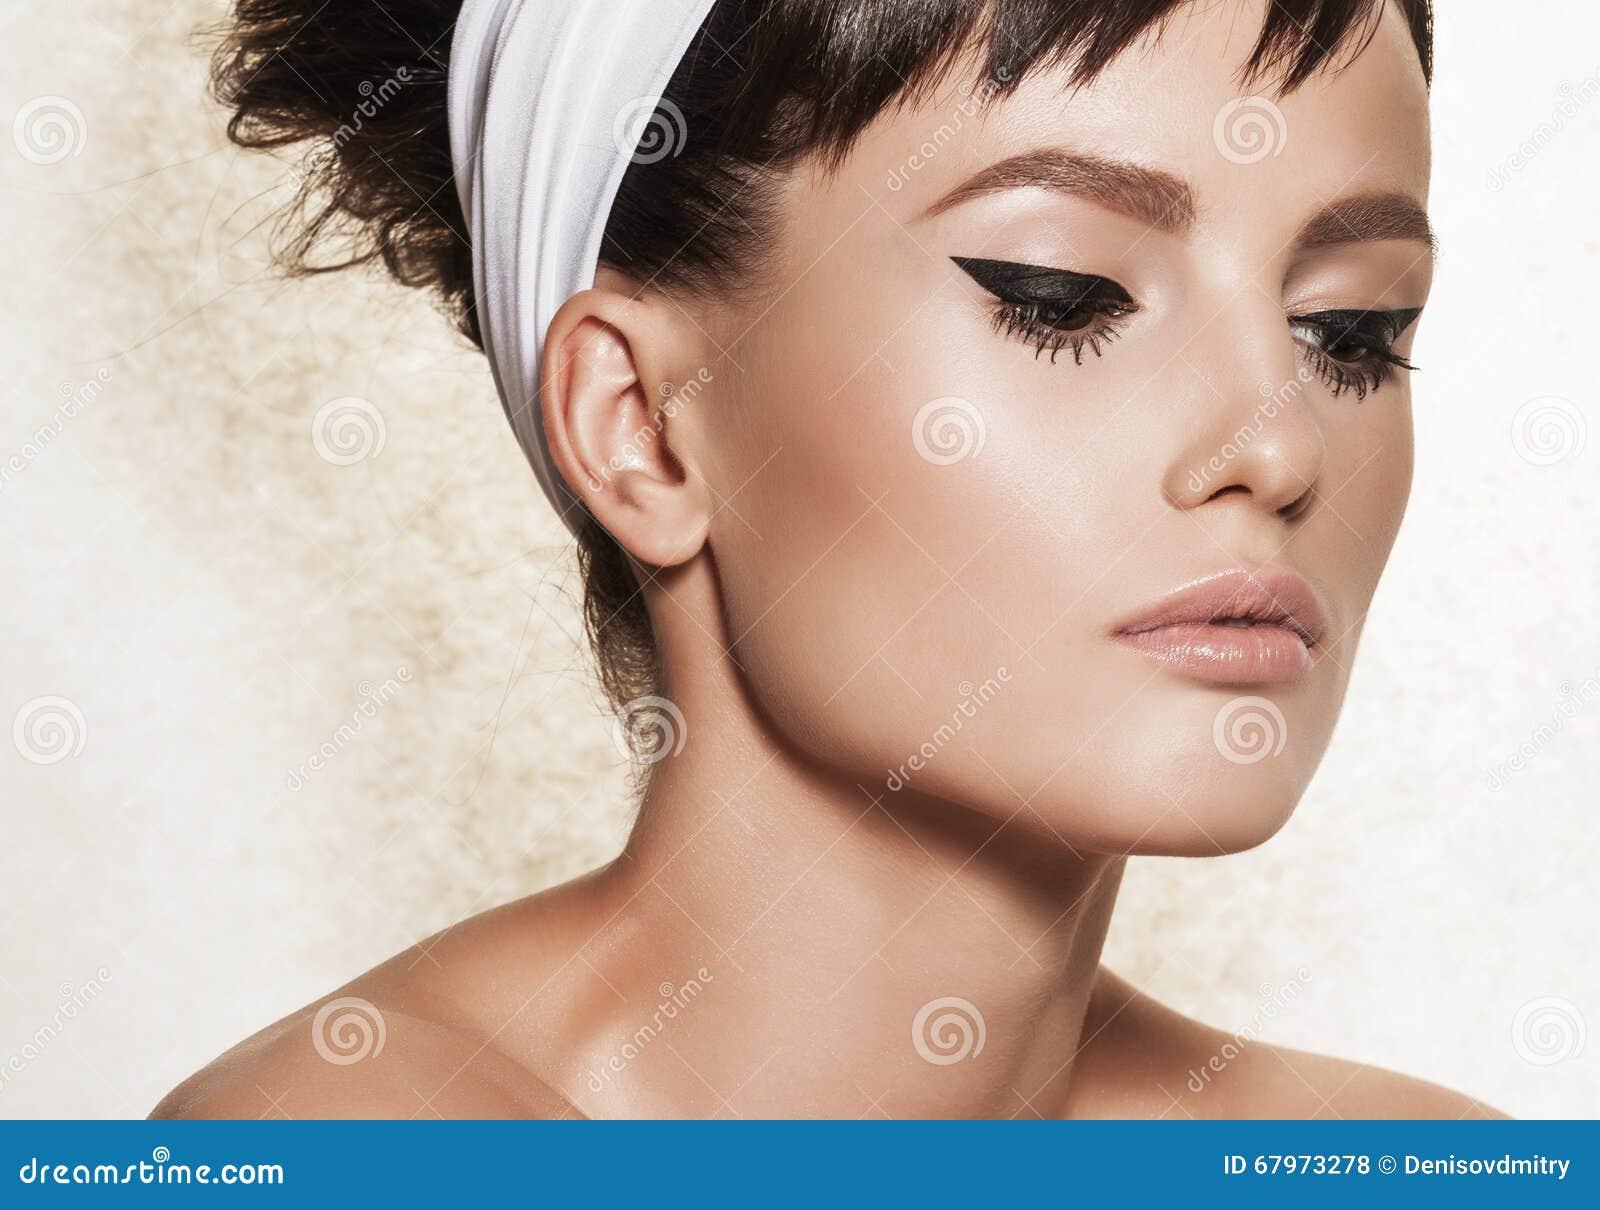 Closeup Portrait Of Elegant Woman With Retro Hairdo And Makeup Stock